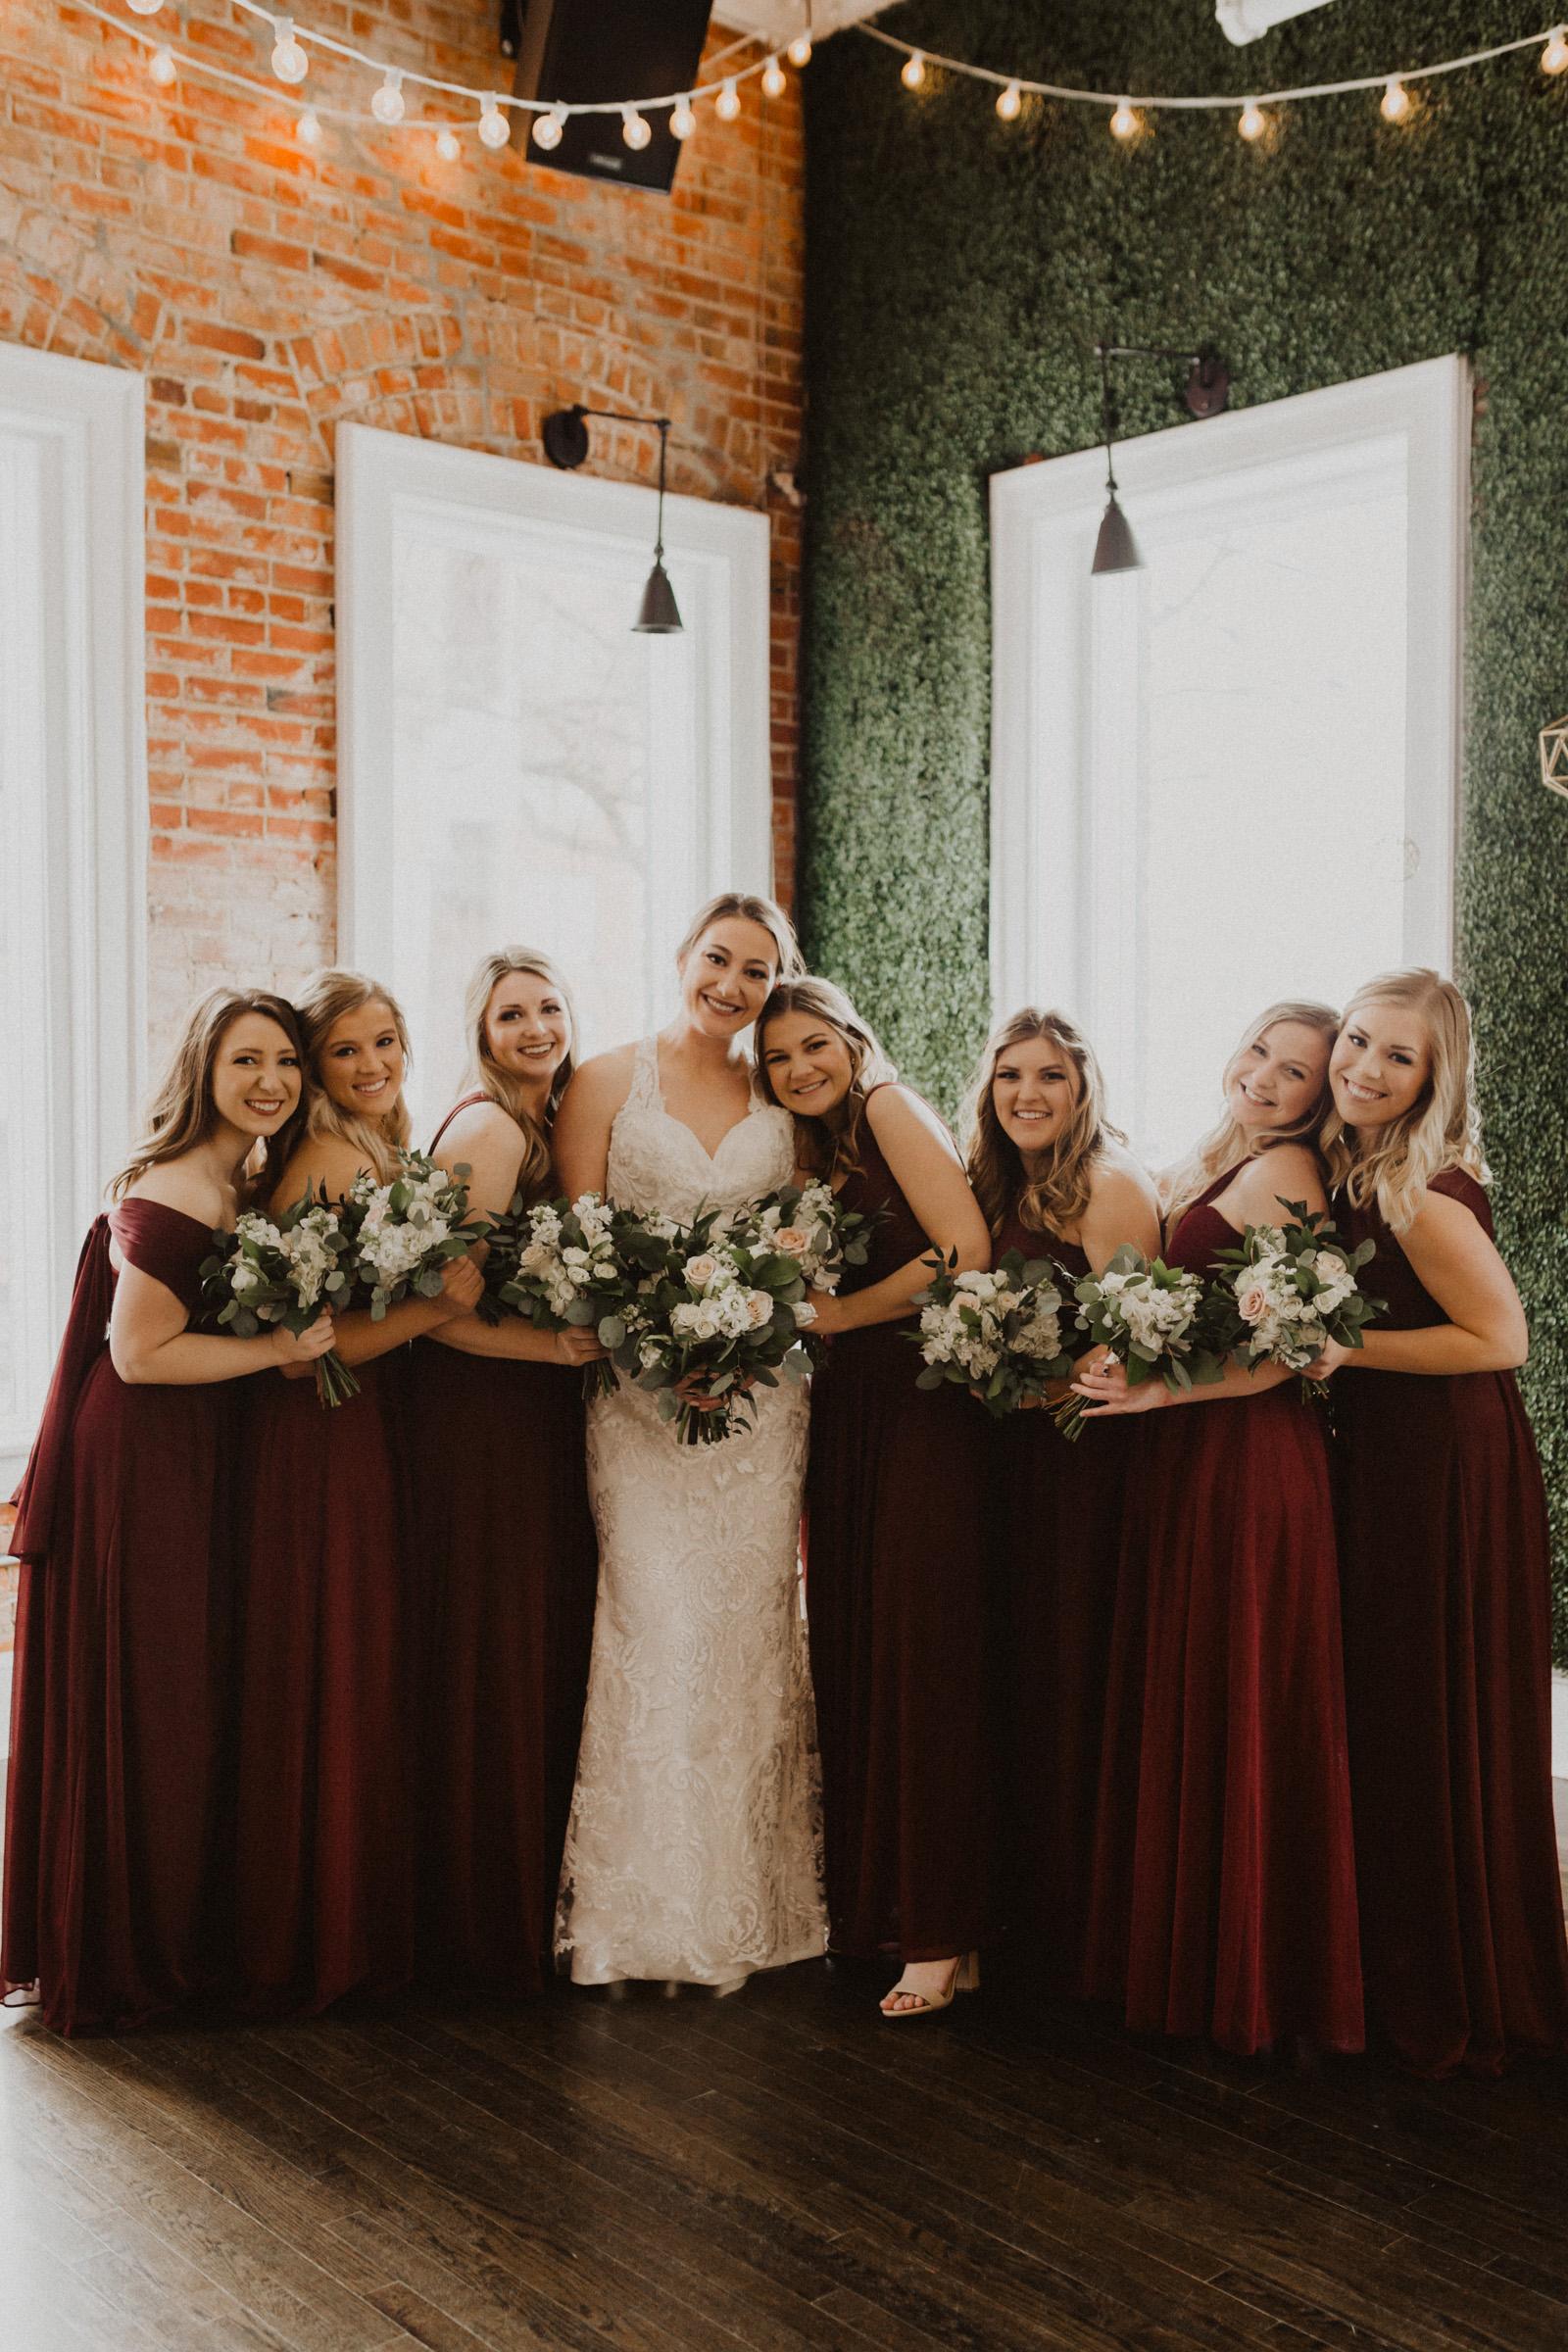 alyssa barletter photography 2016 main kansas city wedding rainy day photographer grace and justin magott-22.jpg